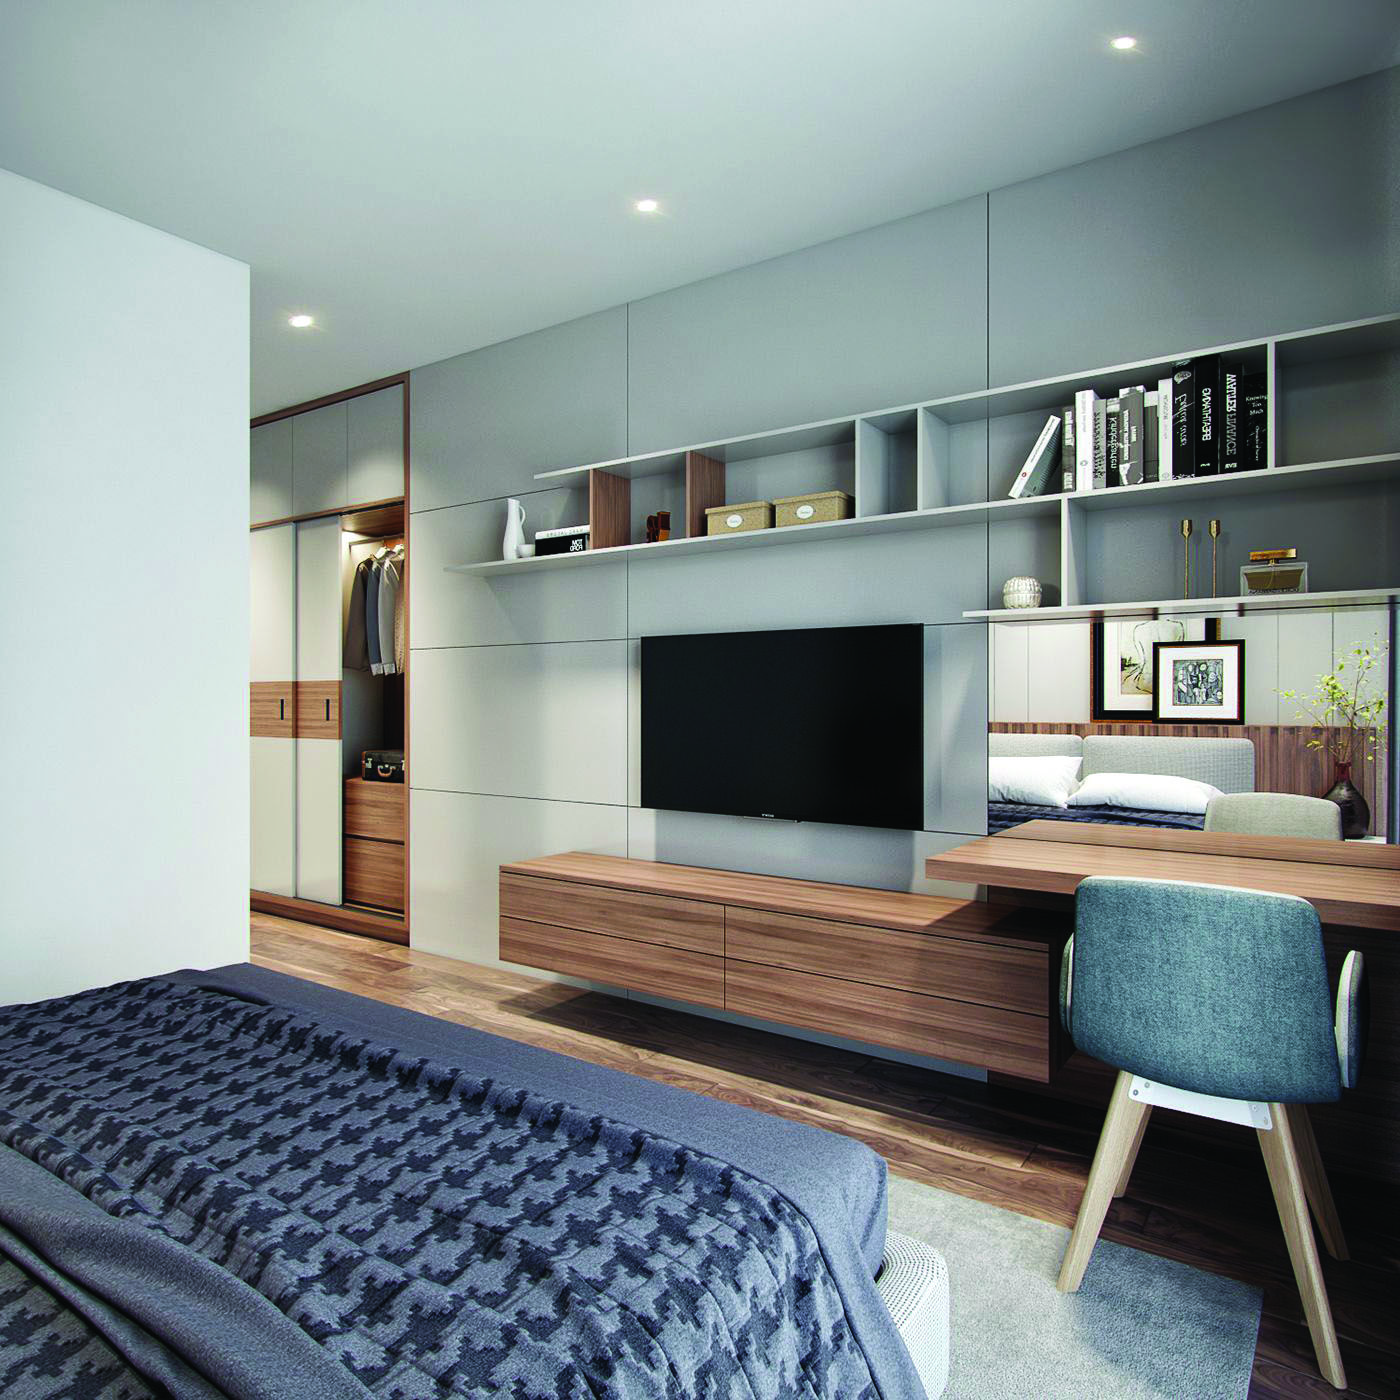 16 Modern Bedroom Ideas You Ll Love Bedroom Interior Unique